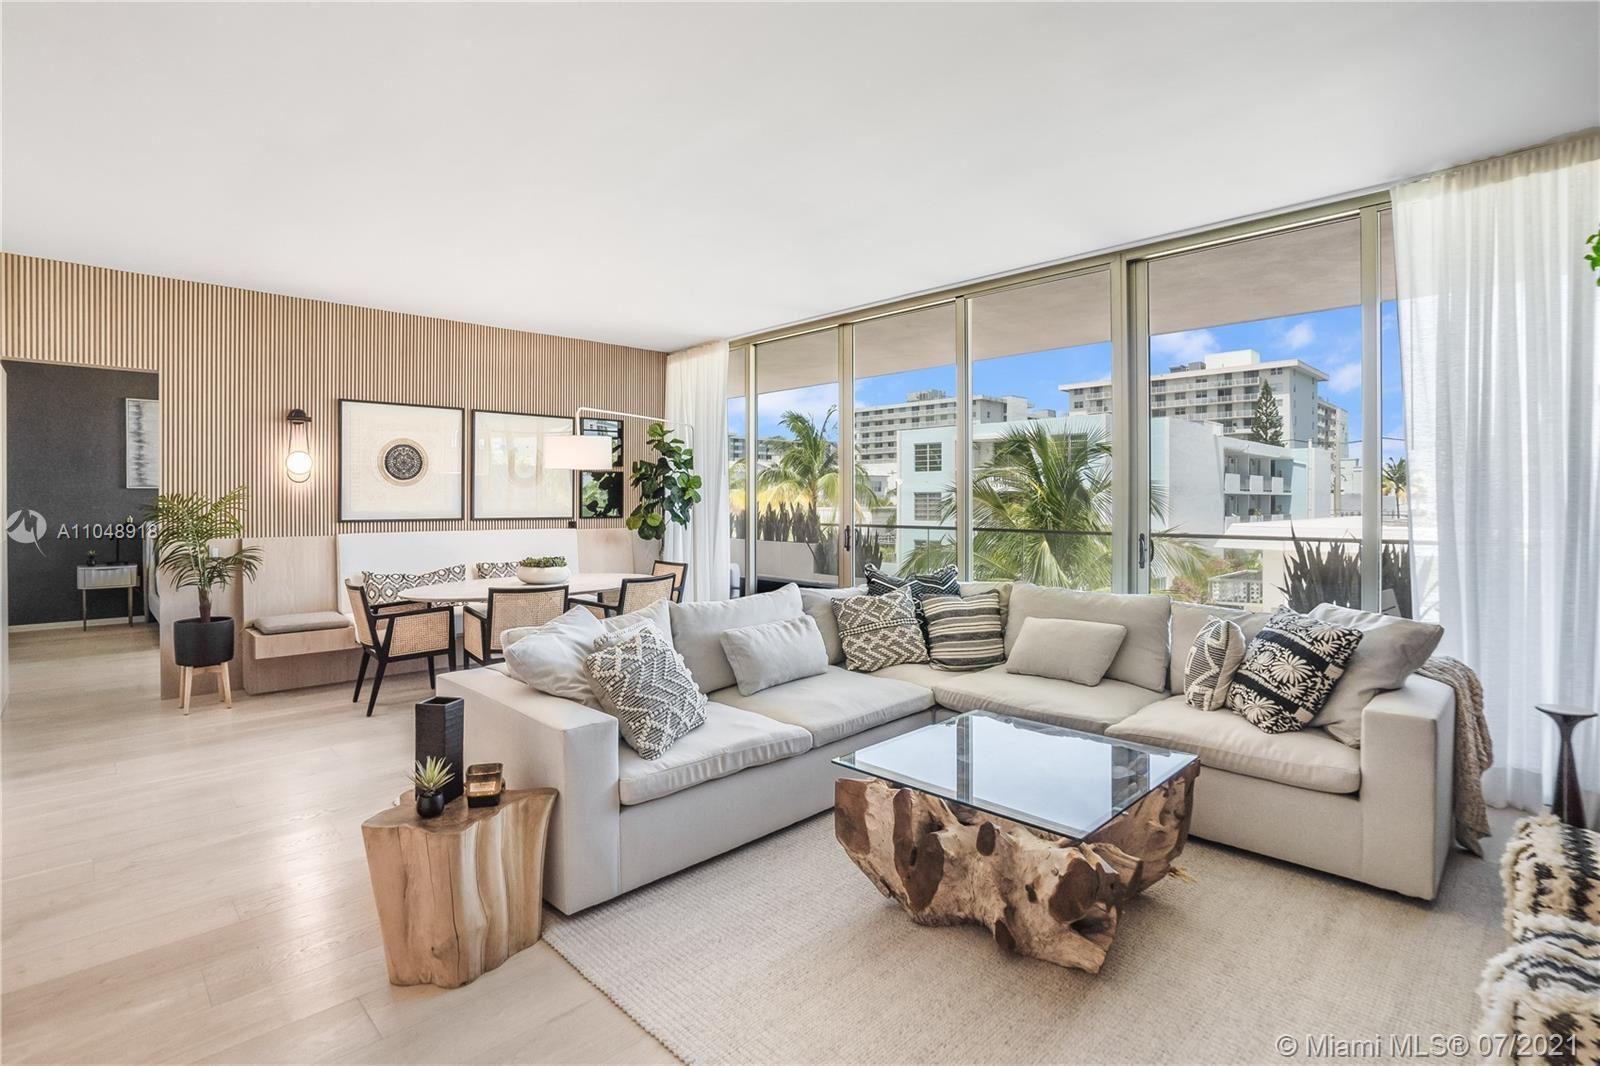 300 Collins Ave #3A, Miami Beach, FL 33139 - #: A11048918